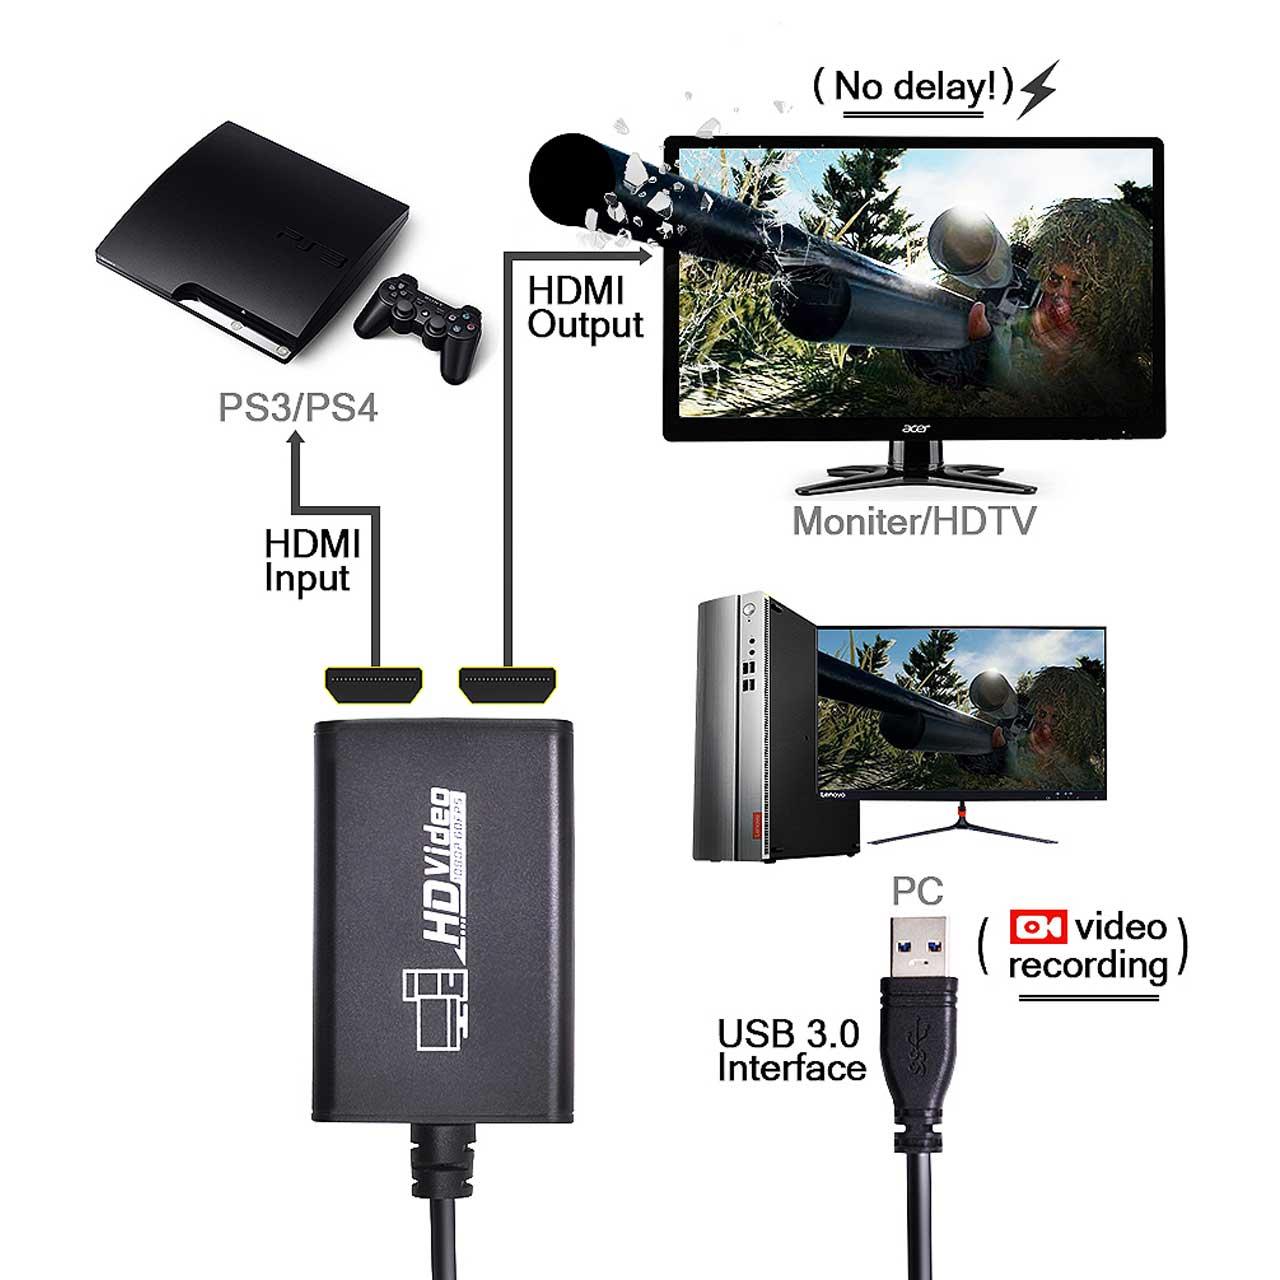 AY02 USB 3.0 to HDMI 1080p HD Video Capture